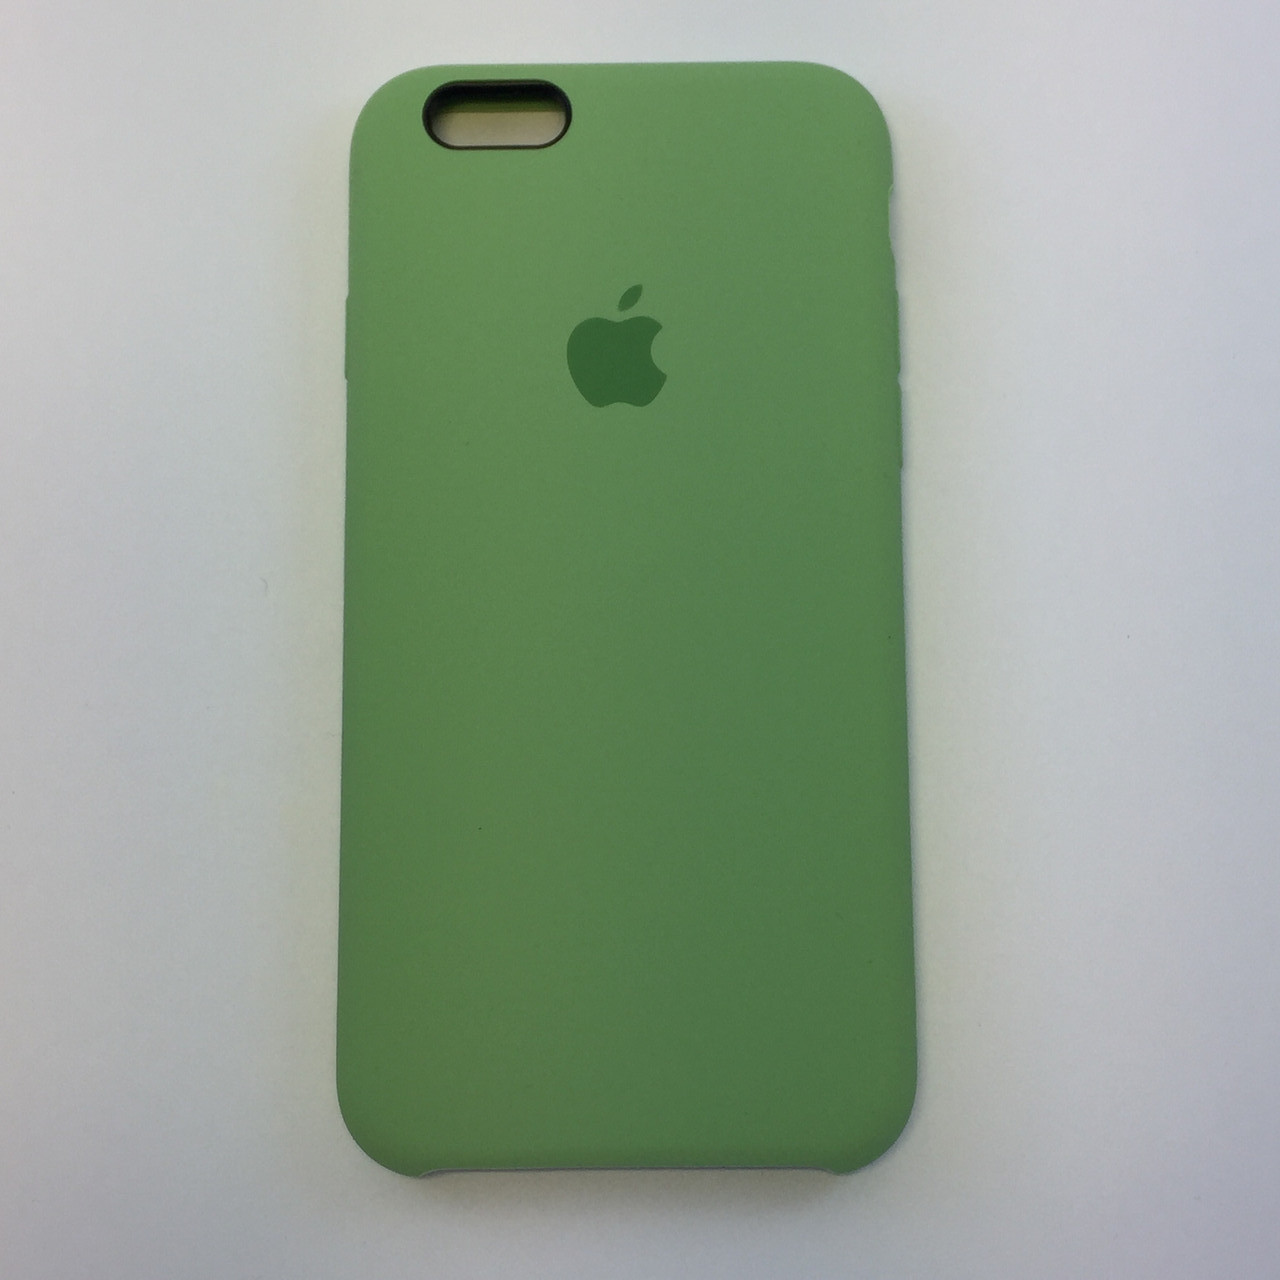 Силиконовый чехол iPhone 6 Plus / 6s Plus, фисташка, copy original